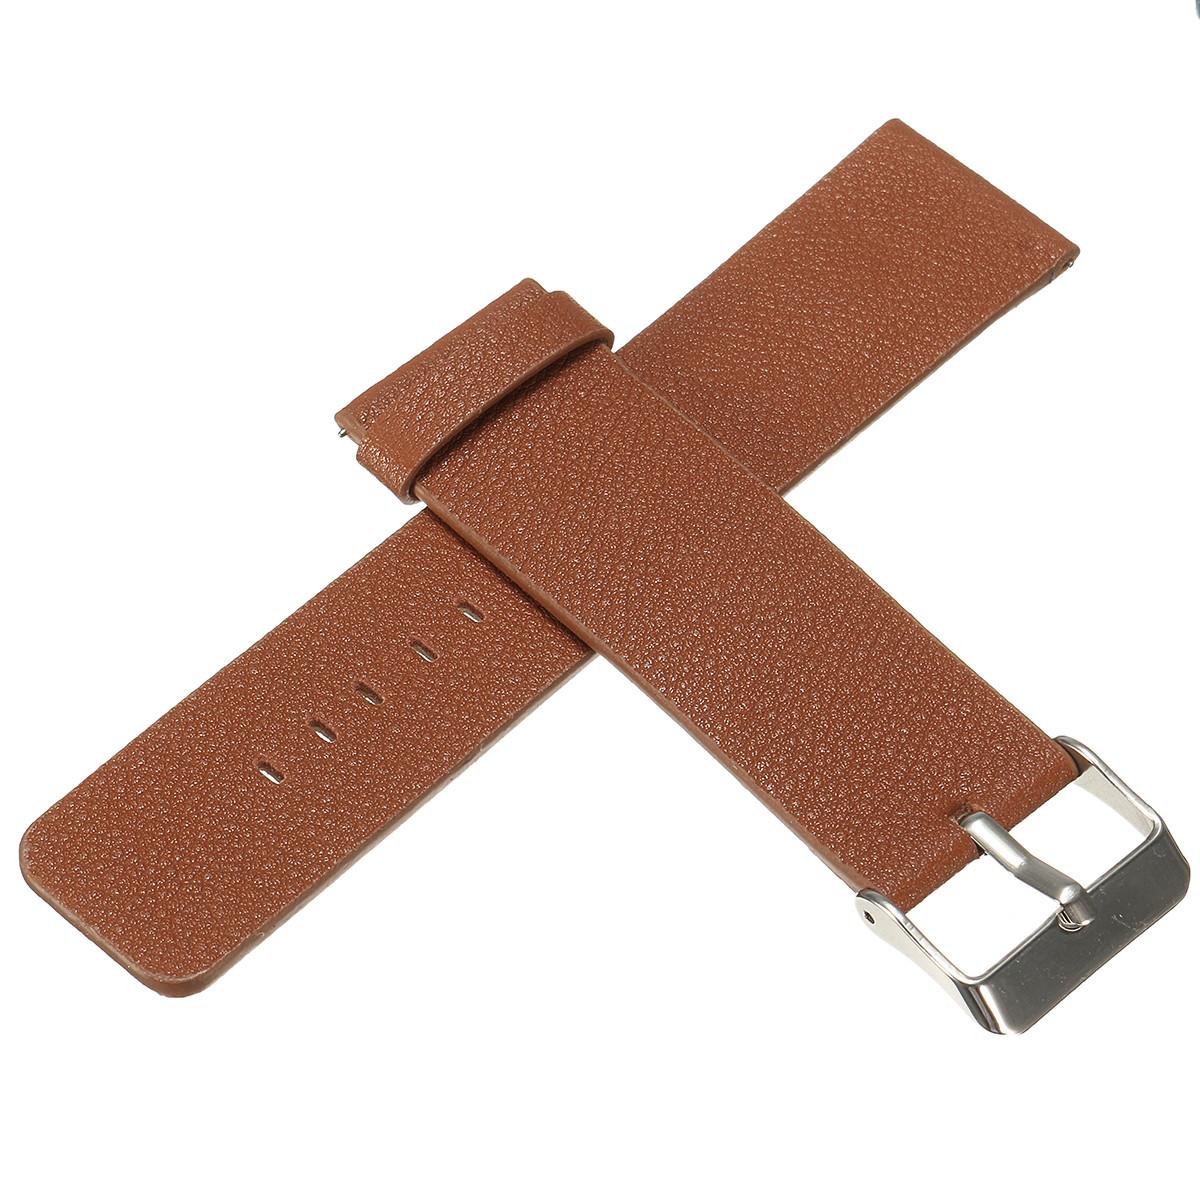 18MM Leather Watch Band Wrist Strap Bracelet For Fitbit Blaze Smart Watch